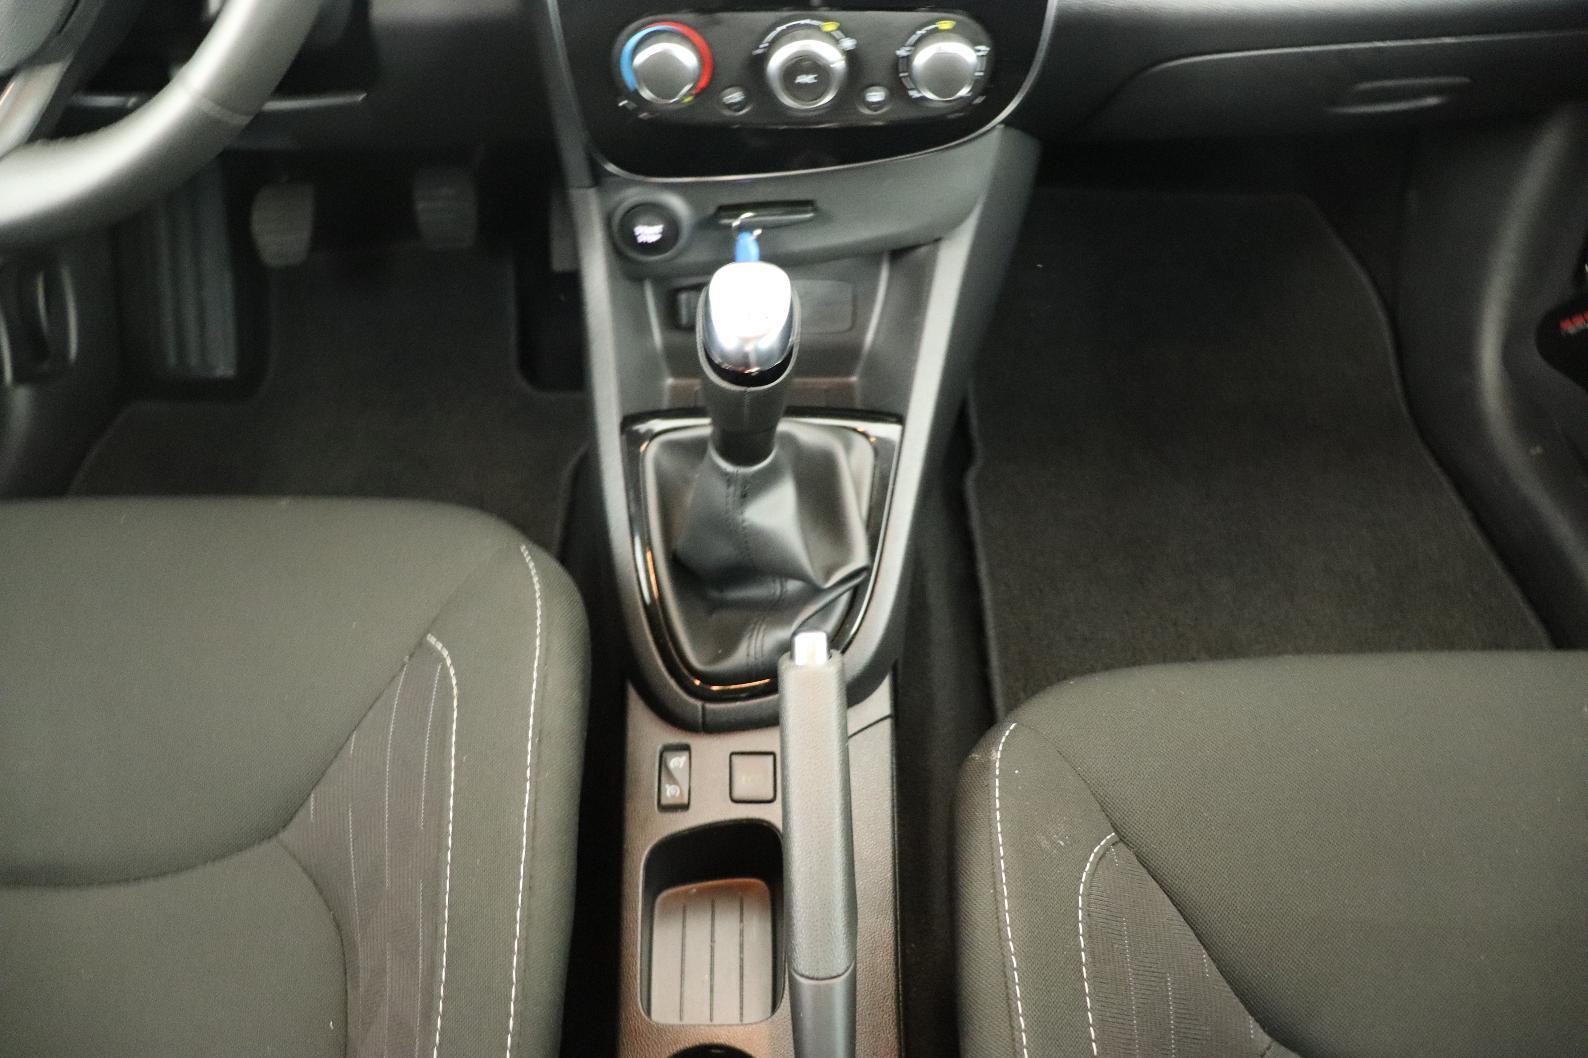 RENAULT CLIO IV Clio TCe 90 E6C Limited